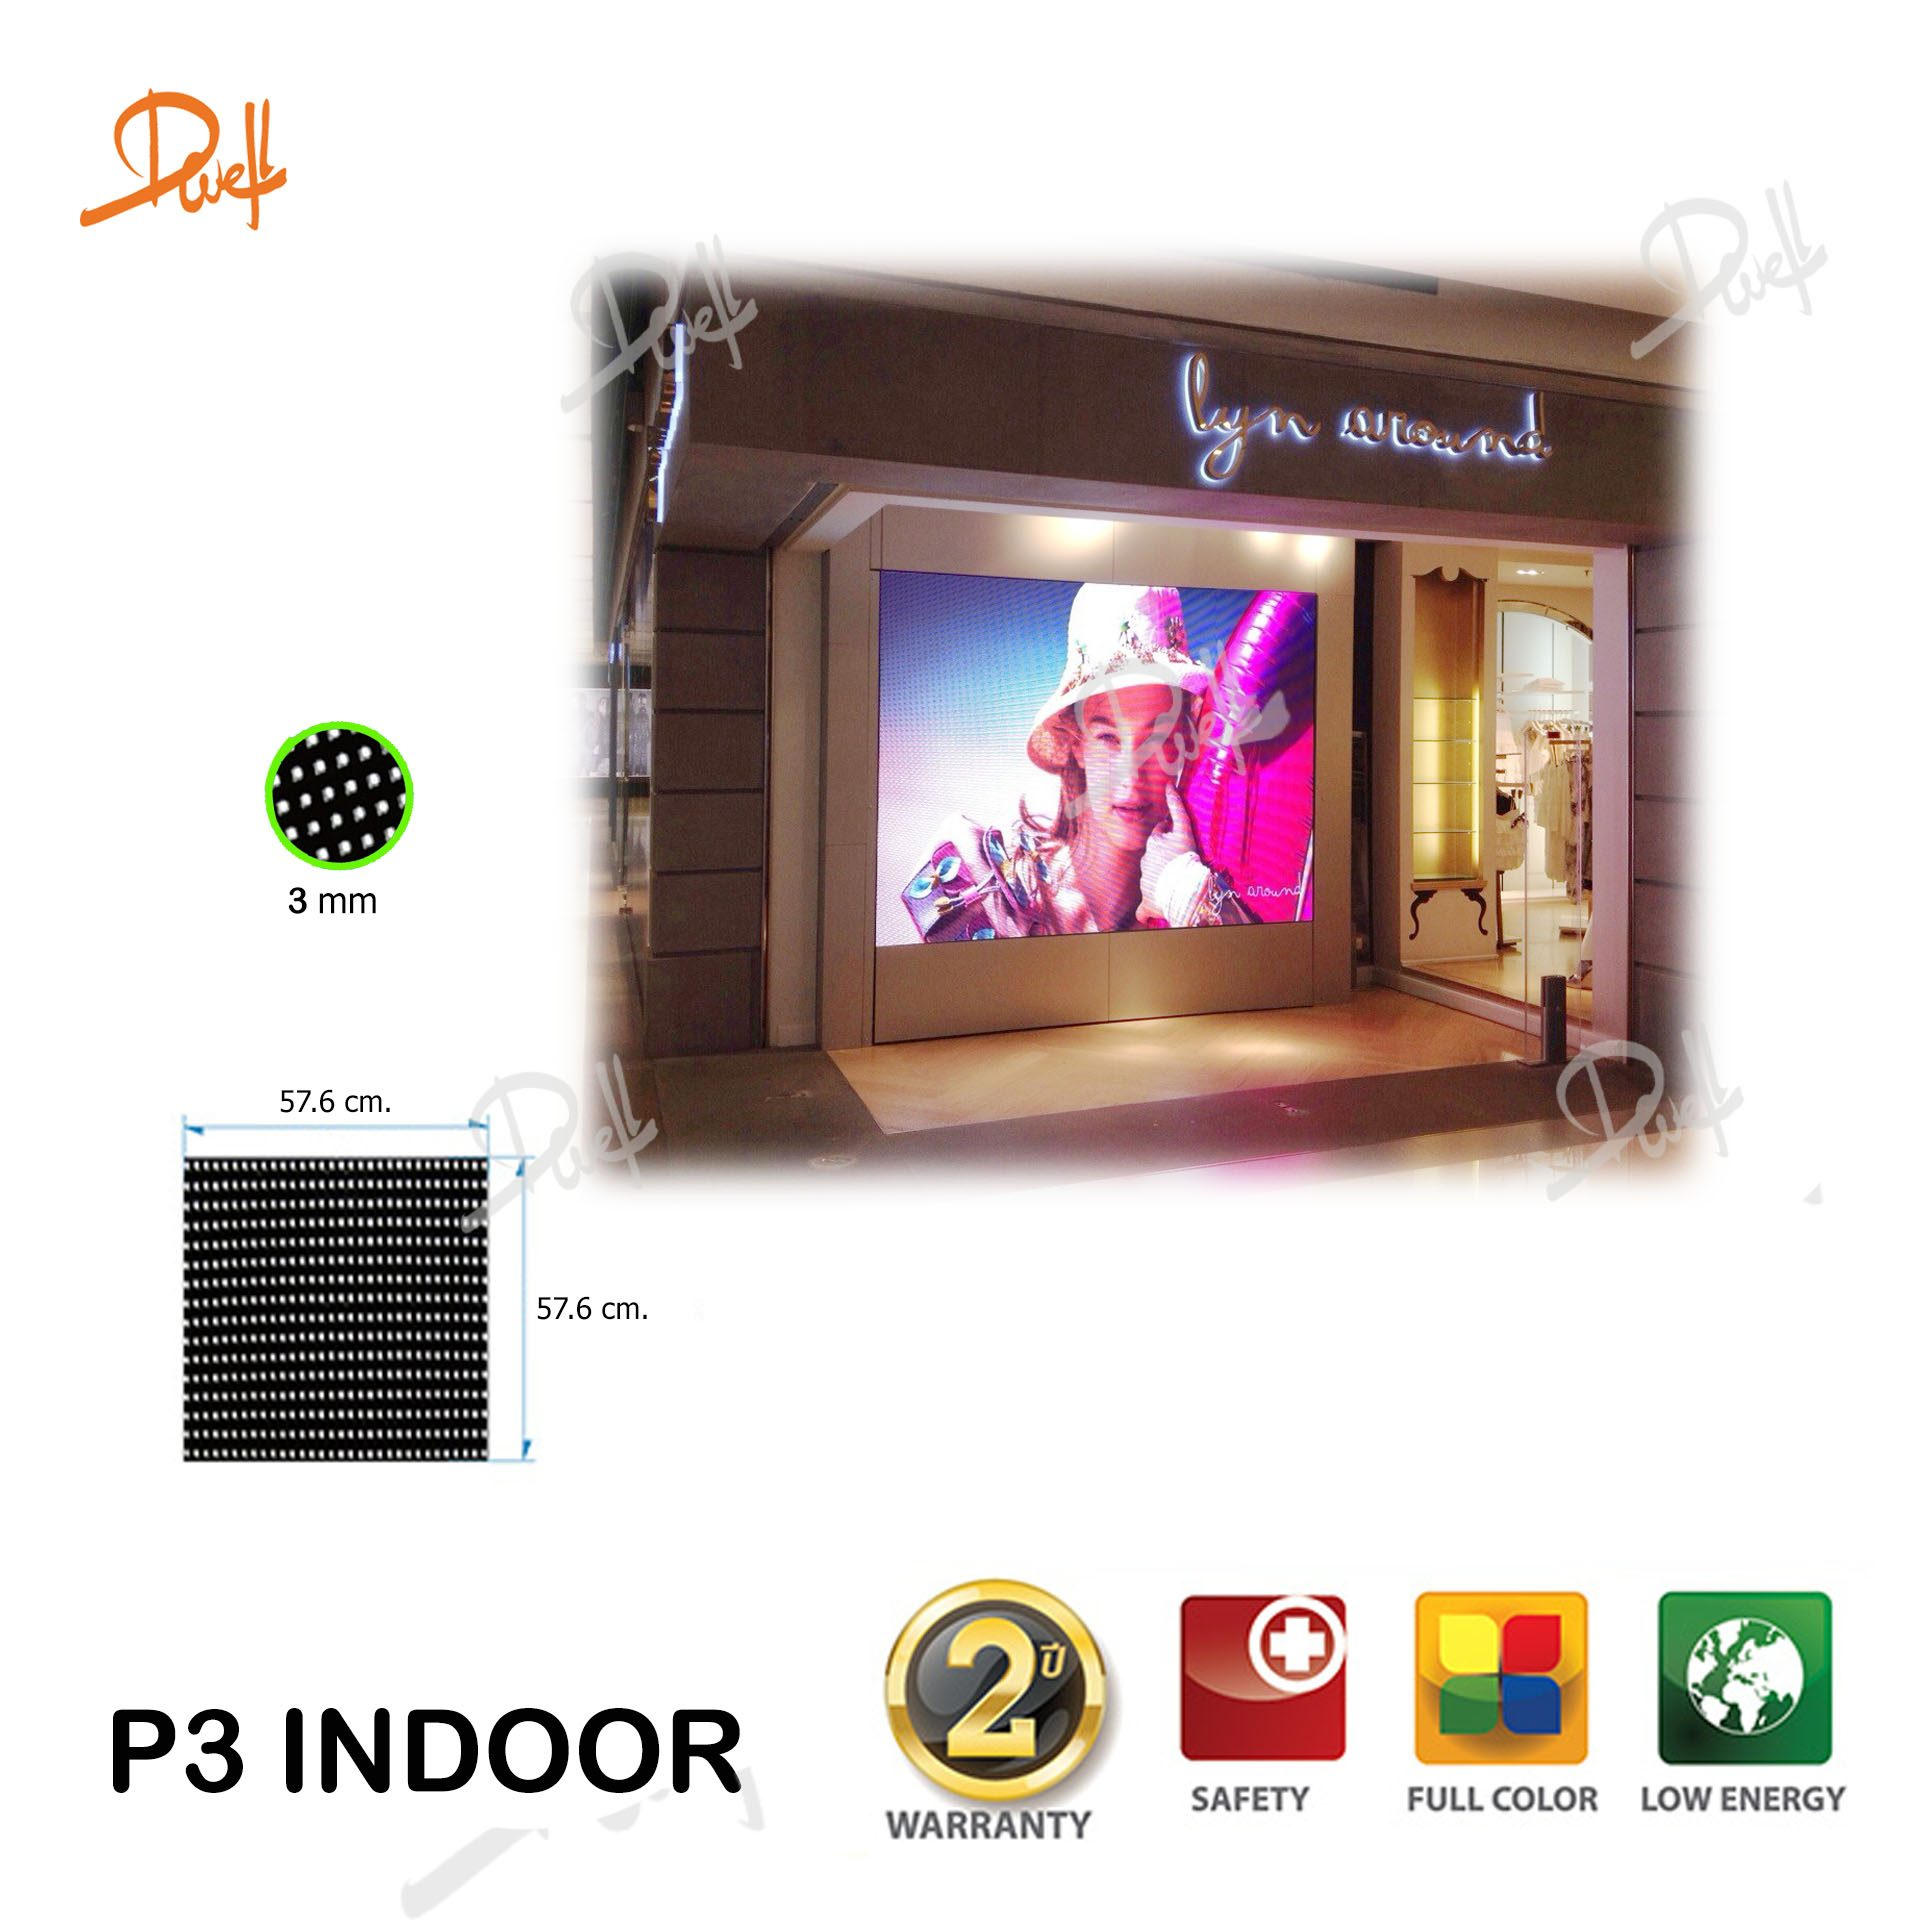 LED Display จอทีวีขนาดใหญ่ LED Full Color Indoor P3